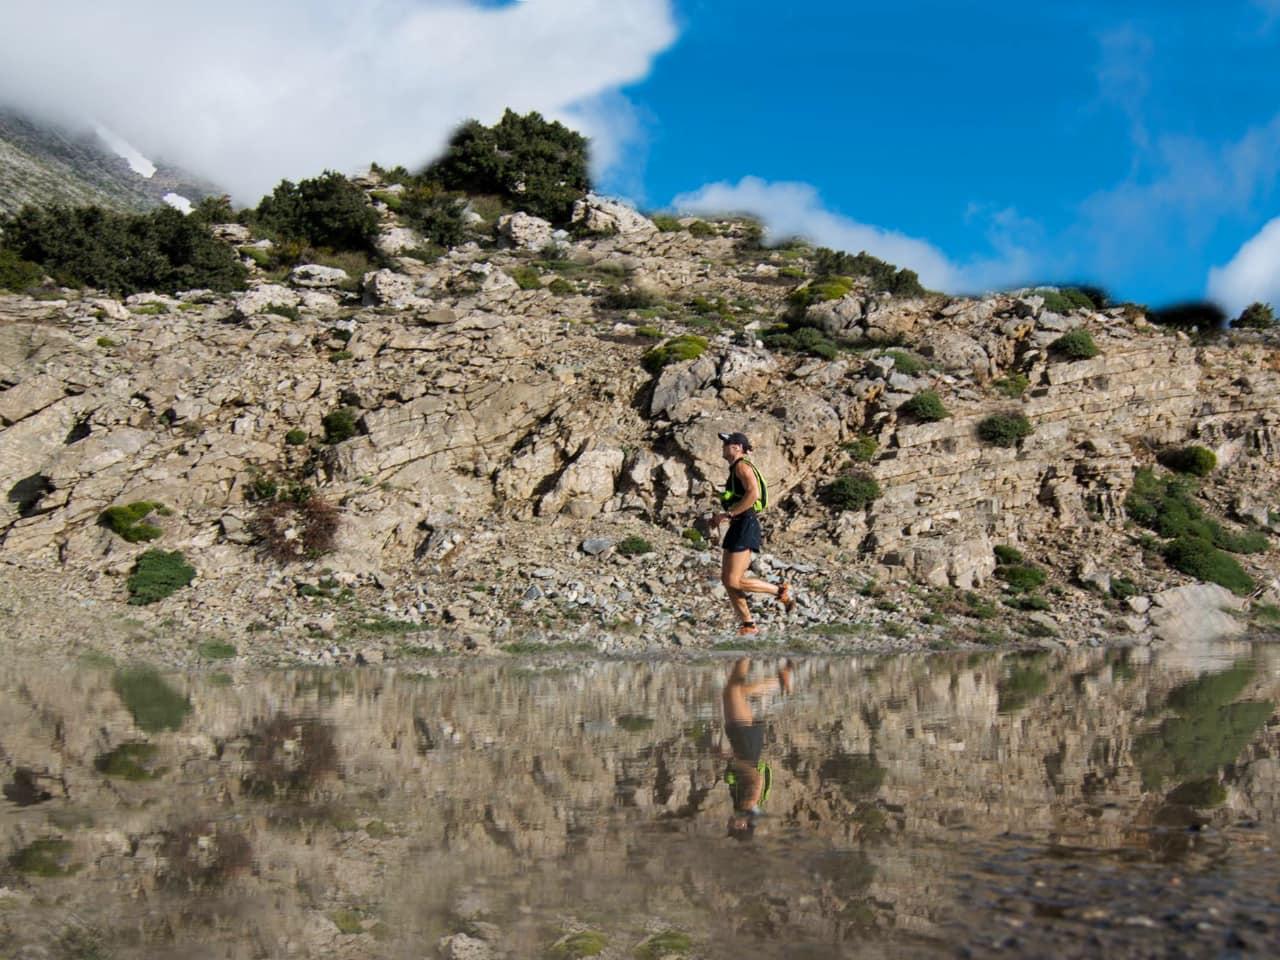 psiloritis race rethymno crete, best running race crete, ida mountain running race rethimno crete, best activities rethimno crete, rethymno crete things to do, small trail race rethimno, mountain running trail crete